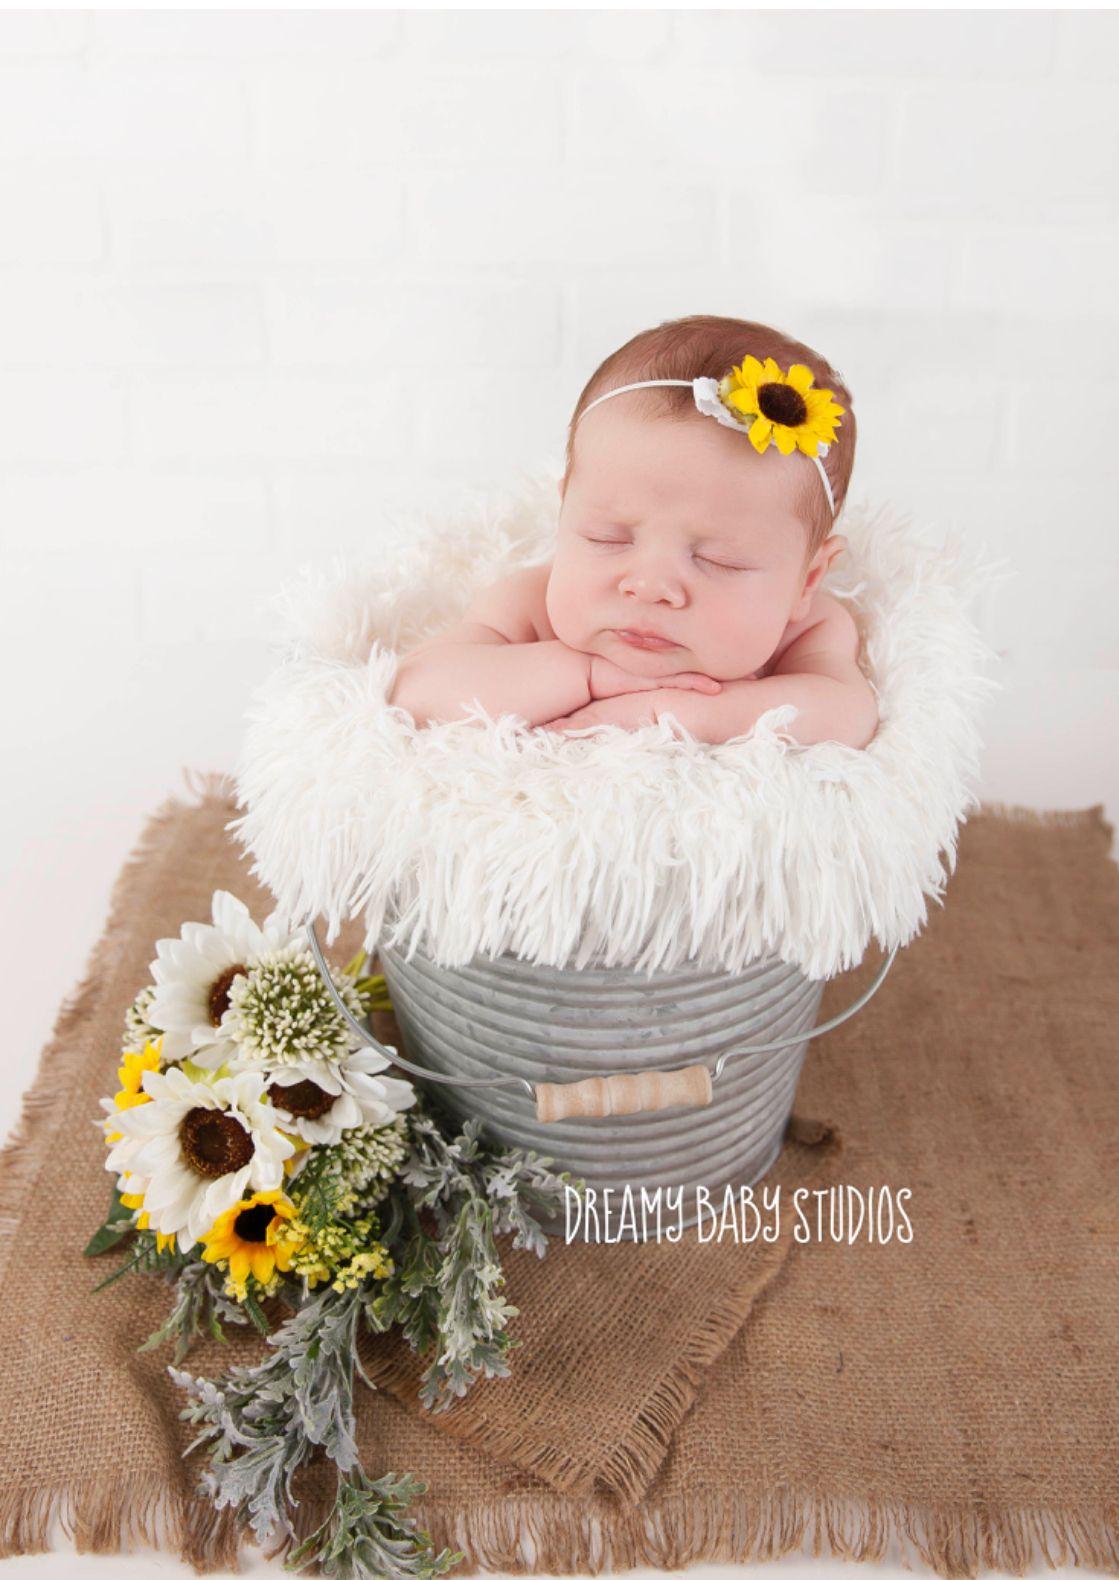 Sunflower newborn baby girl dreamy baby studios virginia